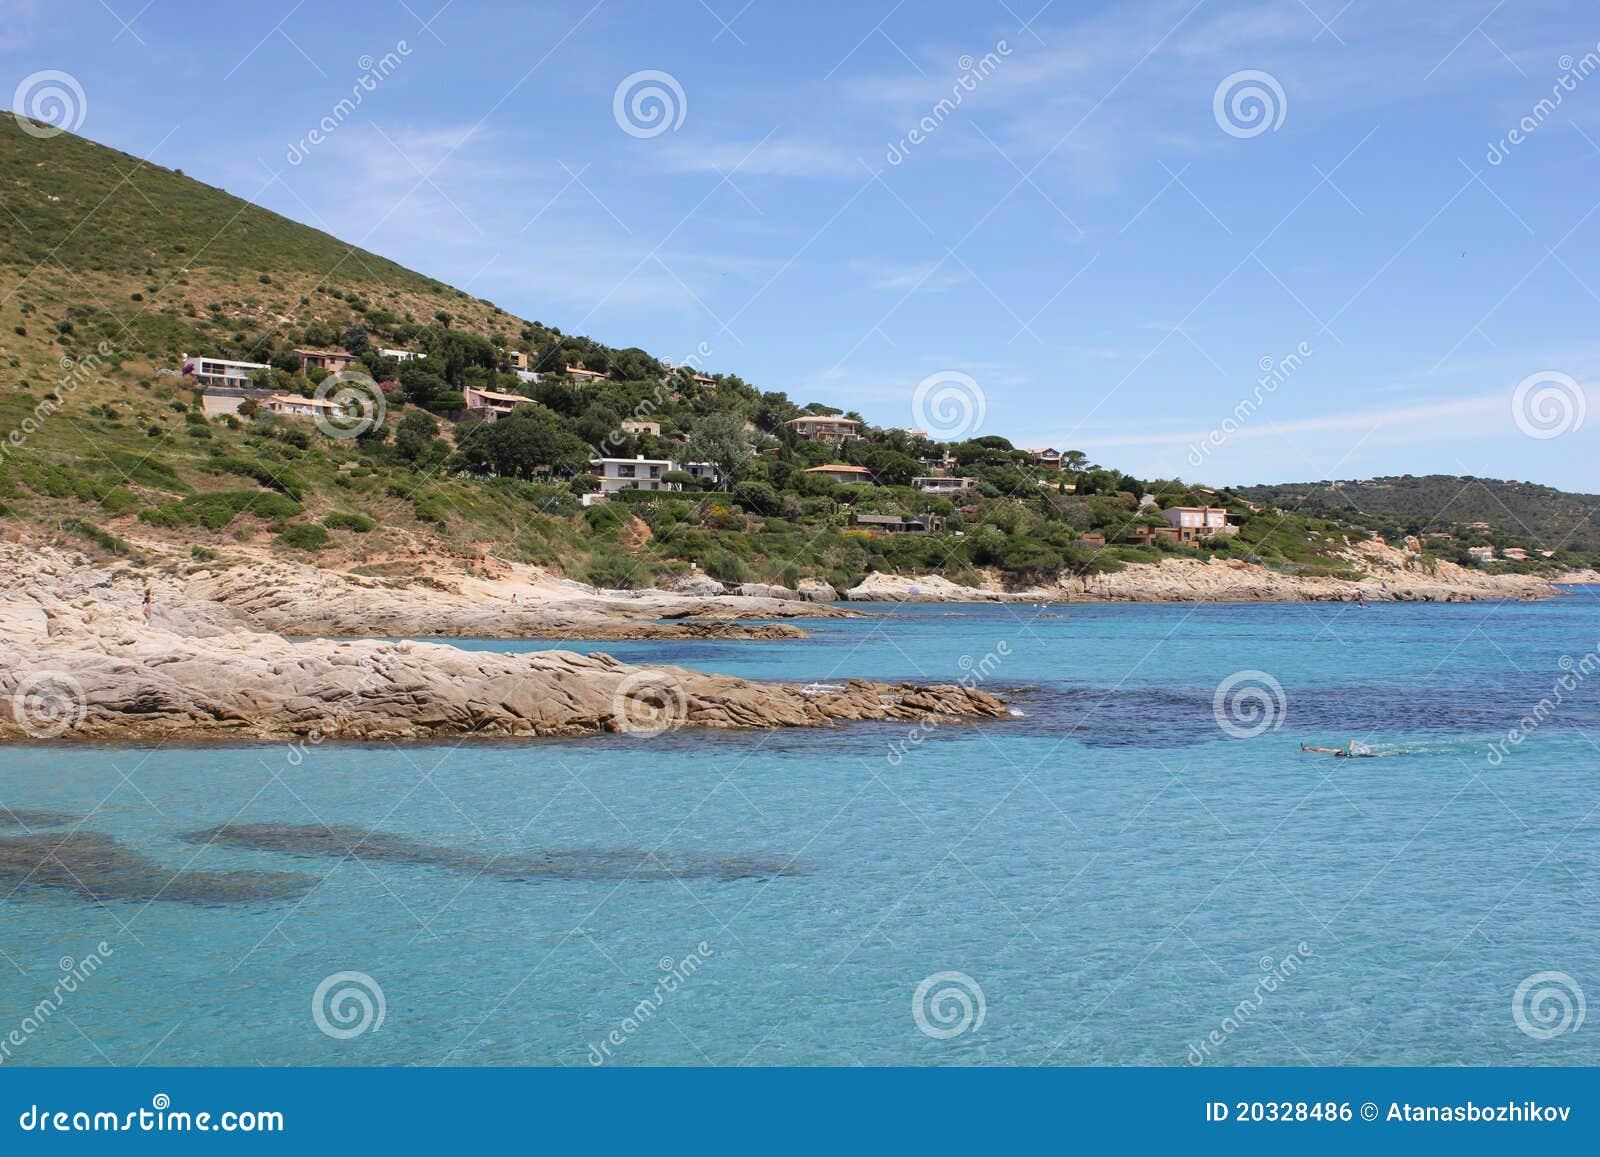 Download Ramatuelle, Bonne Terrase On The French Riviera Stock Photo - Image of garden, monaco: 20328486